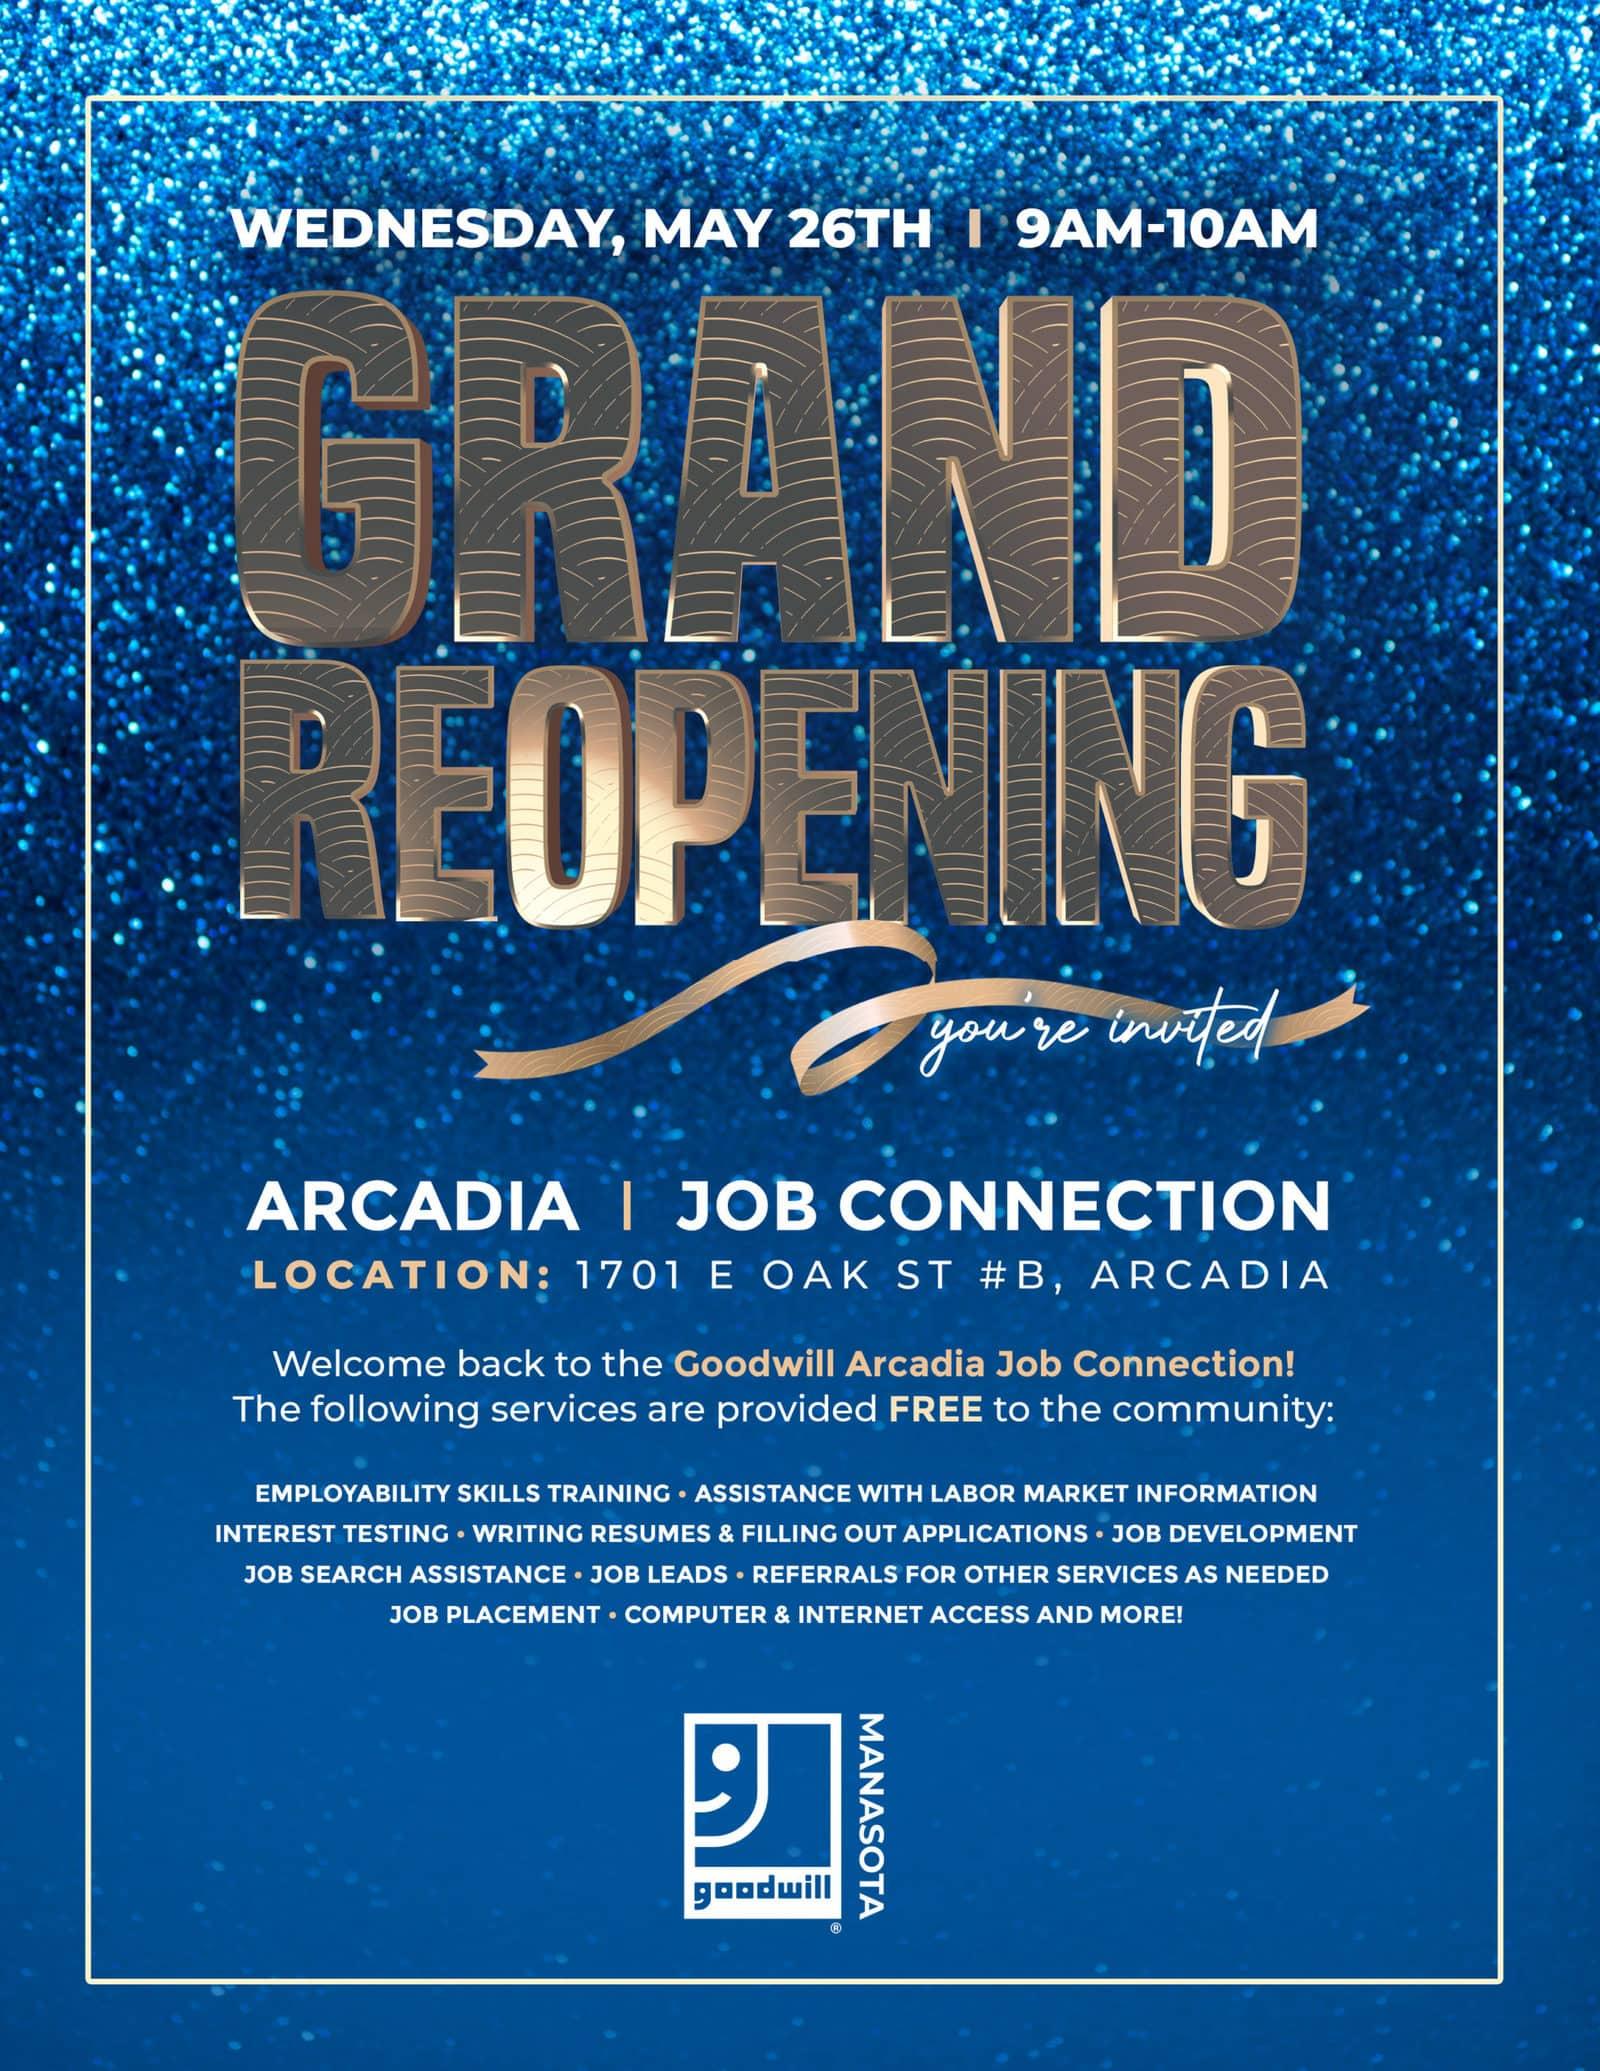 Arcadia JC Ribbon Cutting 5.26.21 (002)